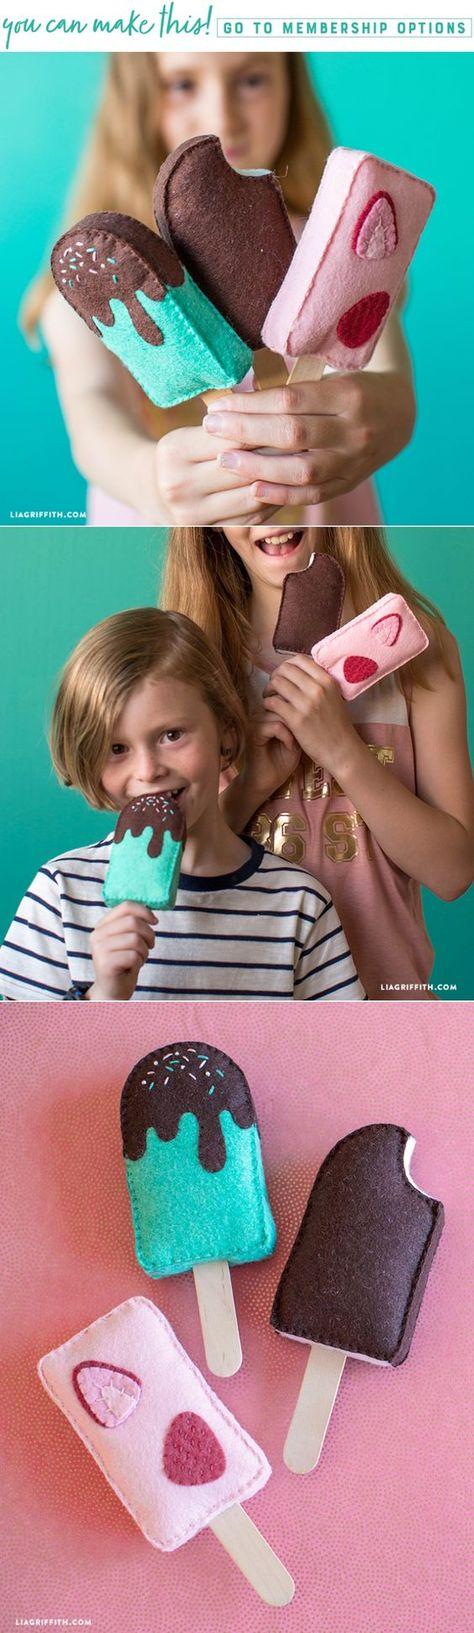 DIY Felt Ice Cream Bars - www.LiaGriffith.com - #feltcrafts #kidscrafts #feltpattern #feltpopsicle #felticecream #felttoy #DIYfelt #FeltDIY